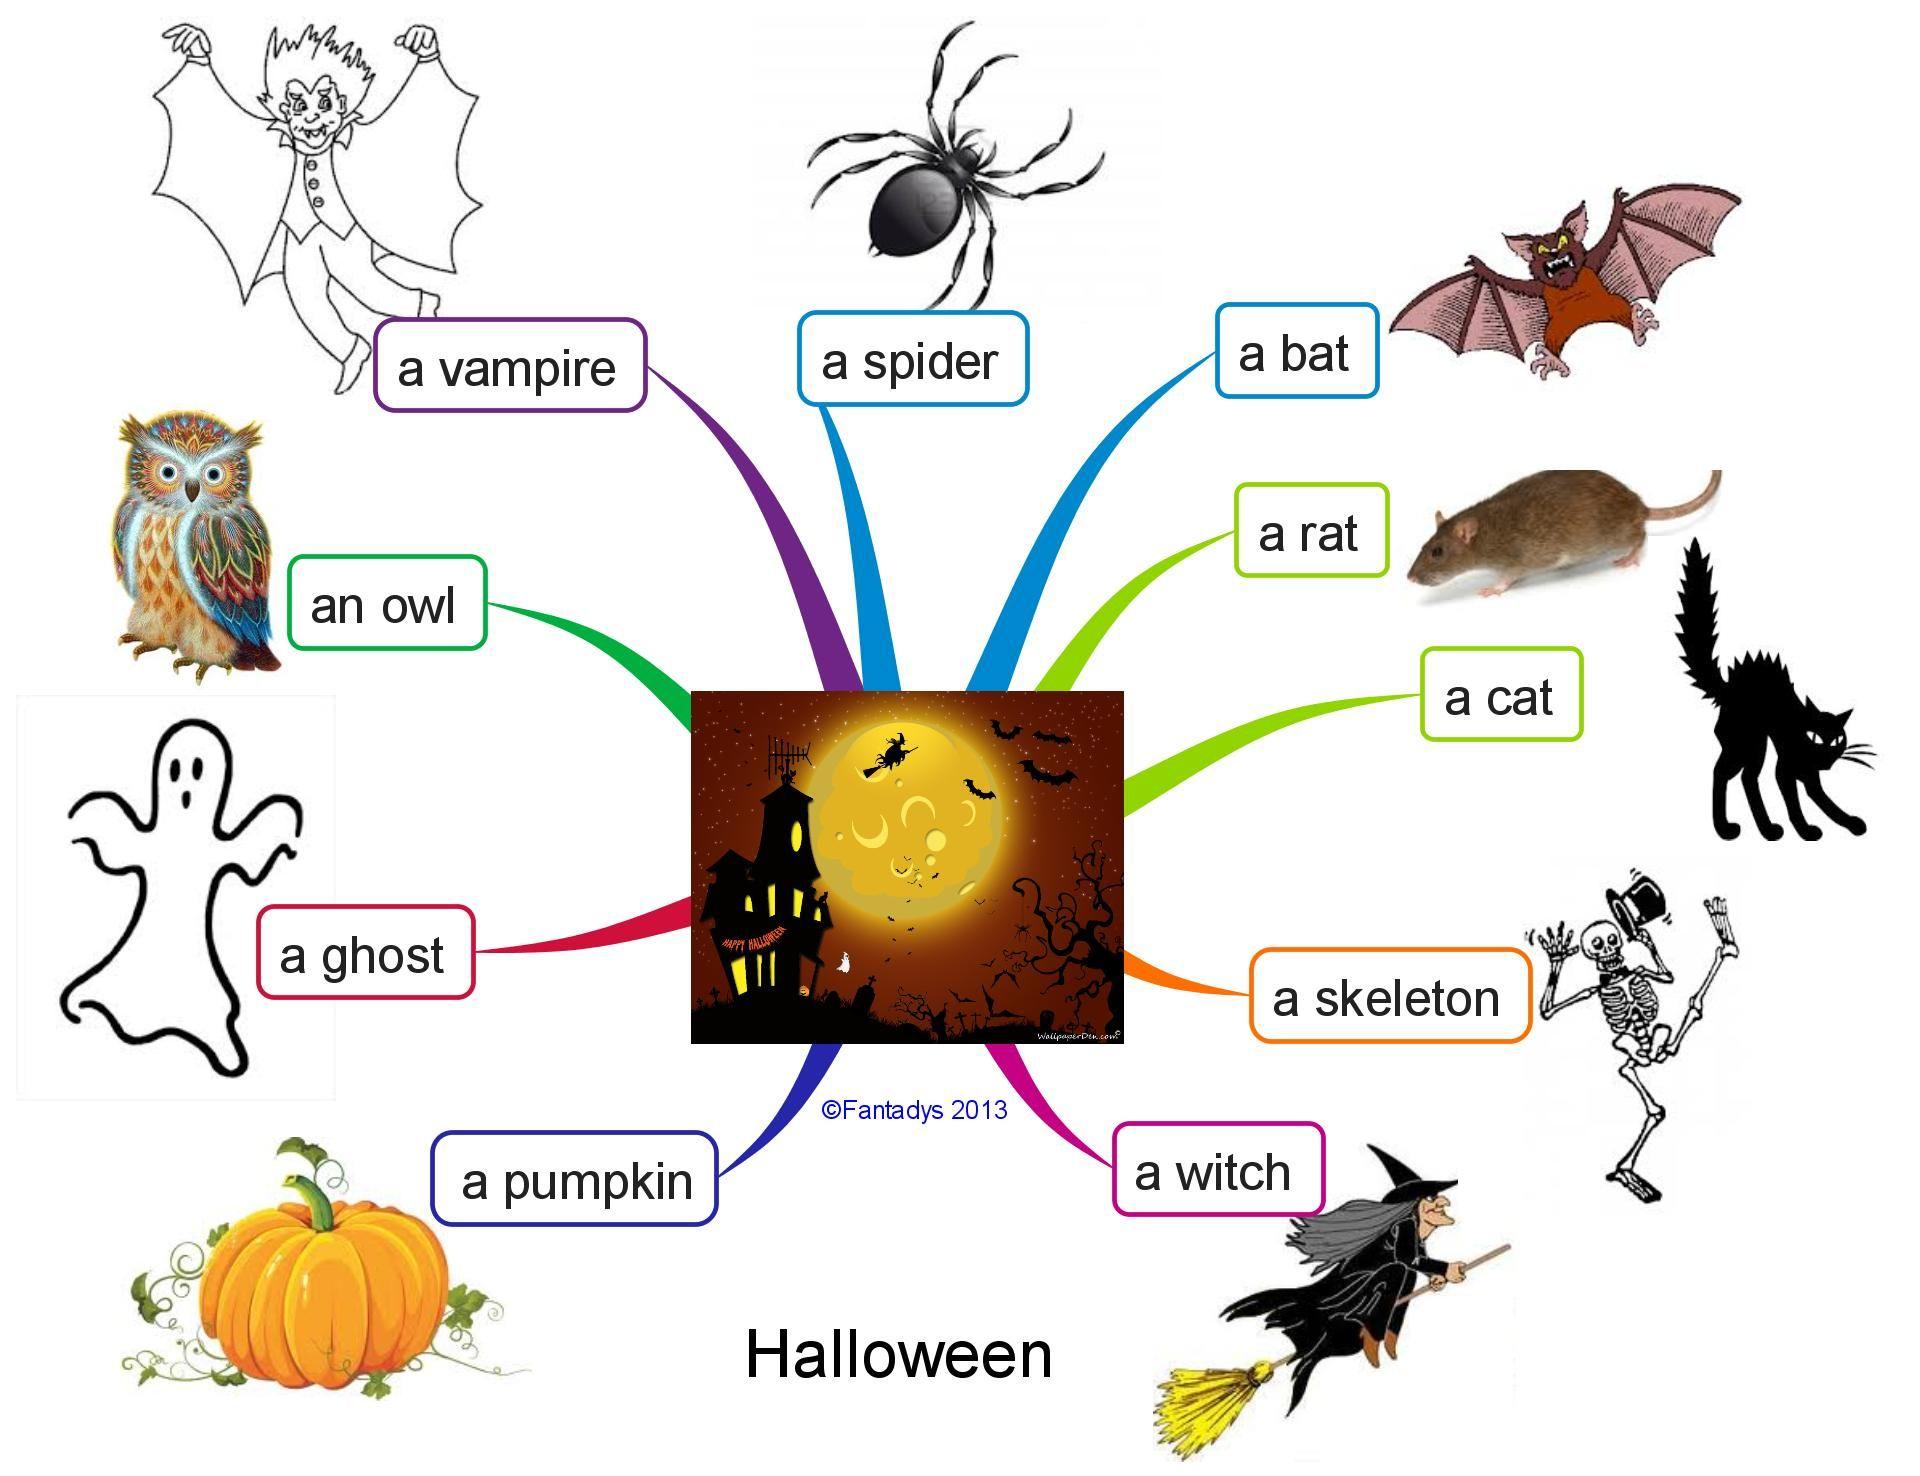 Halloween F | Apprendre L'anglais, Carte Mentale, Vocabulaire serapportantà Halloween Ce2